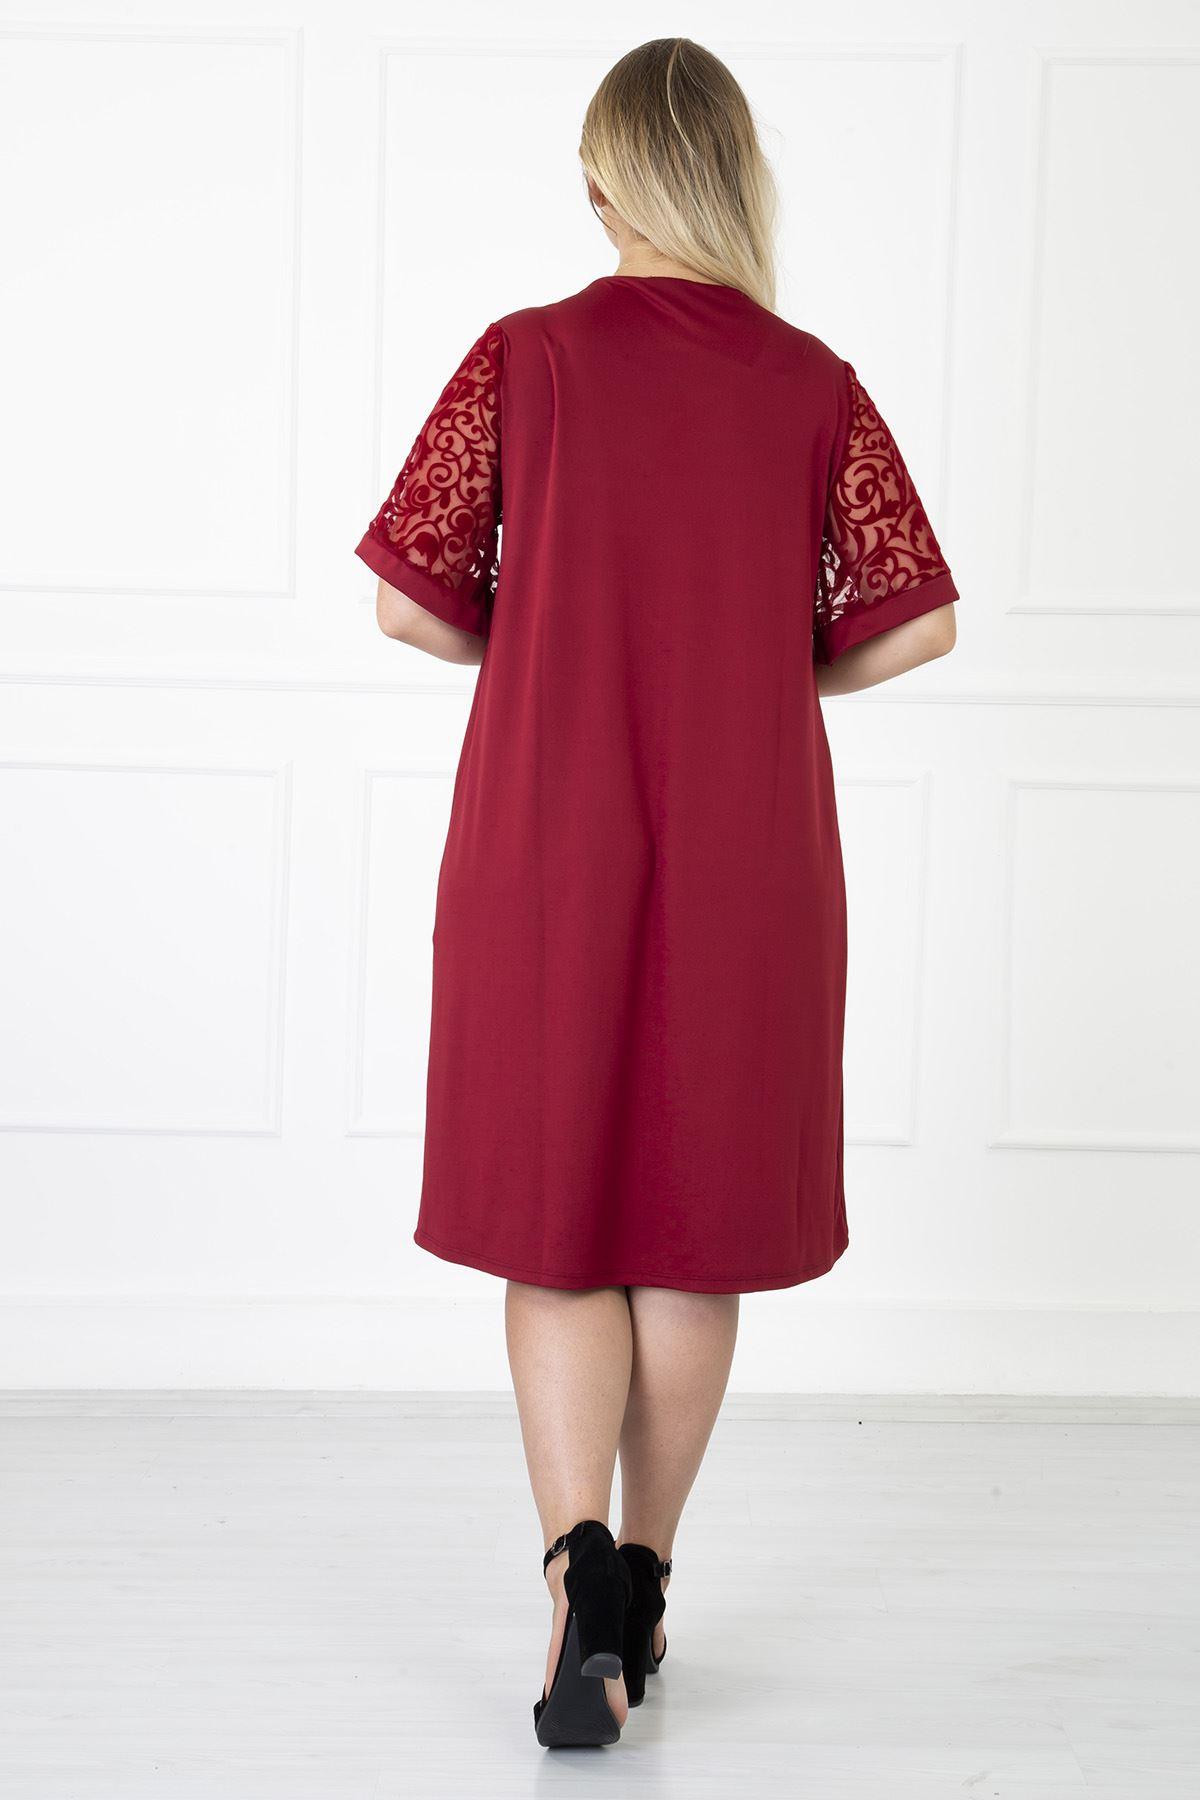 Kimono Kol Bordo Büyük Beden Elbise 31B-1181